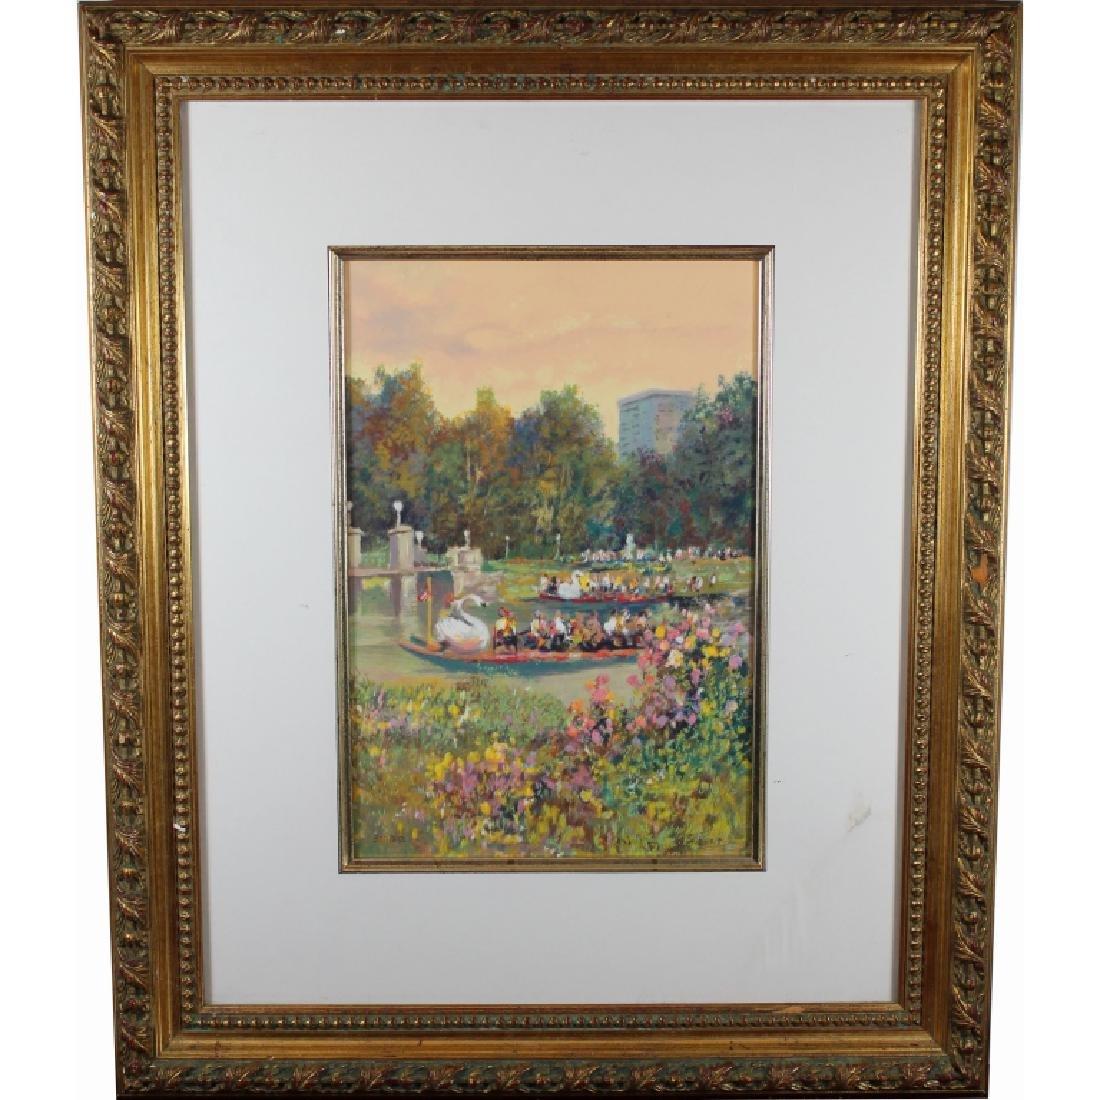 Boston Public Garden with Swan Boats, Figures